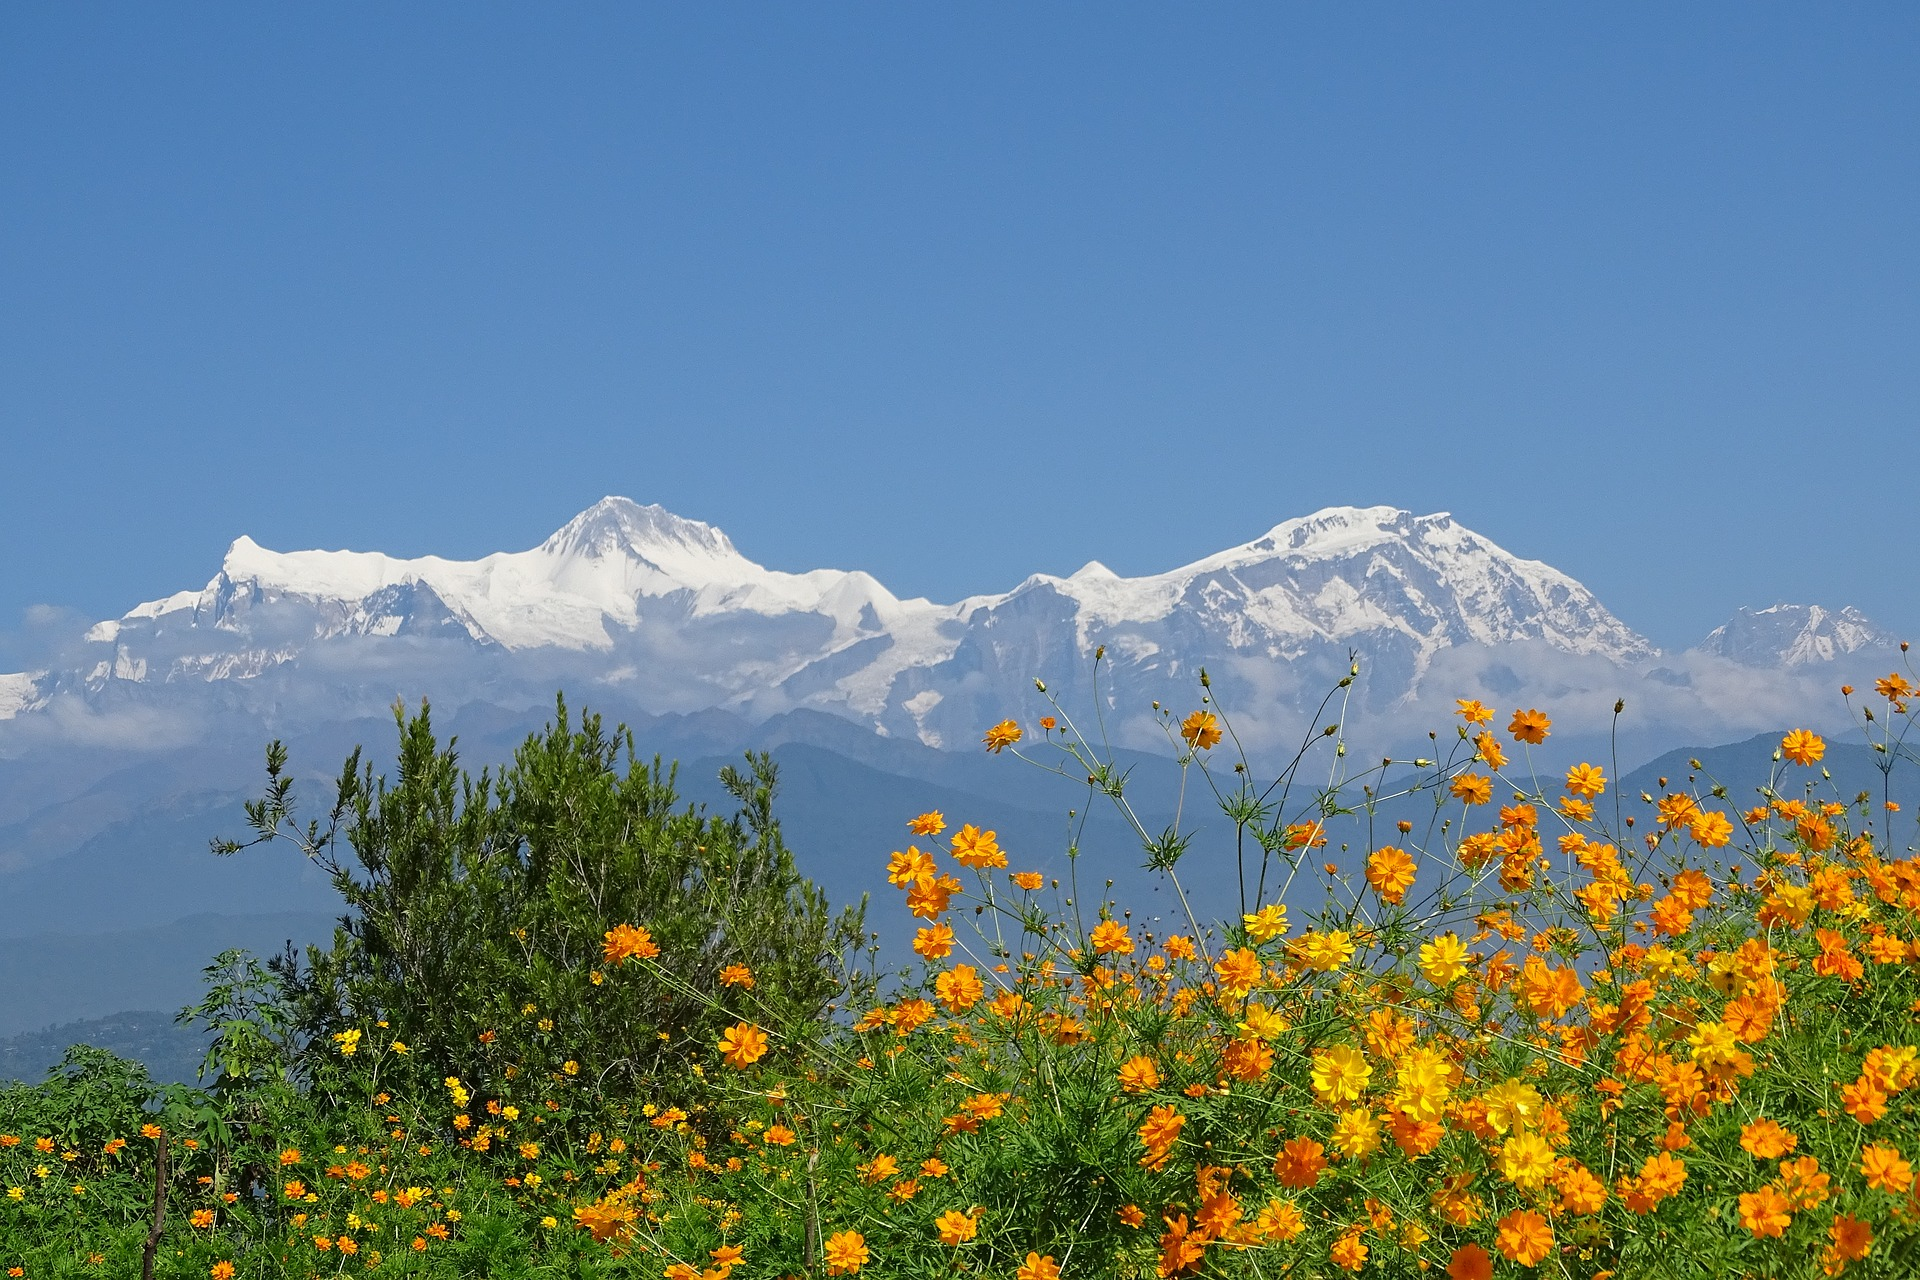 20-day Mount Api Trek in Nepal